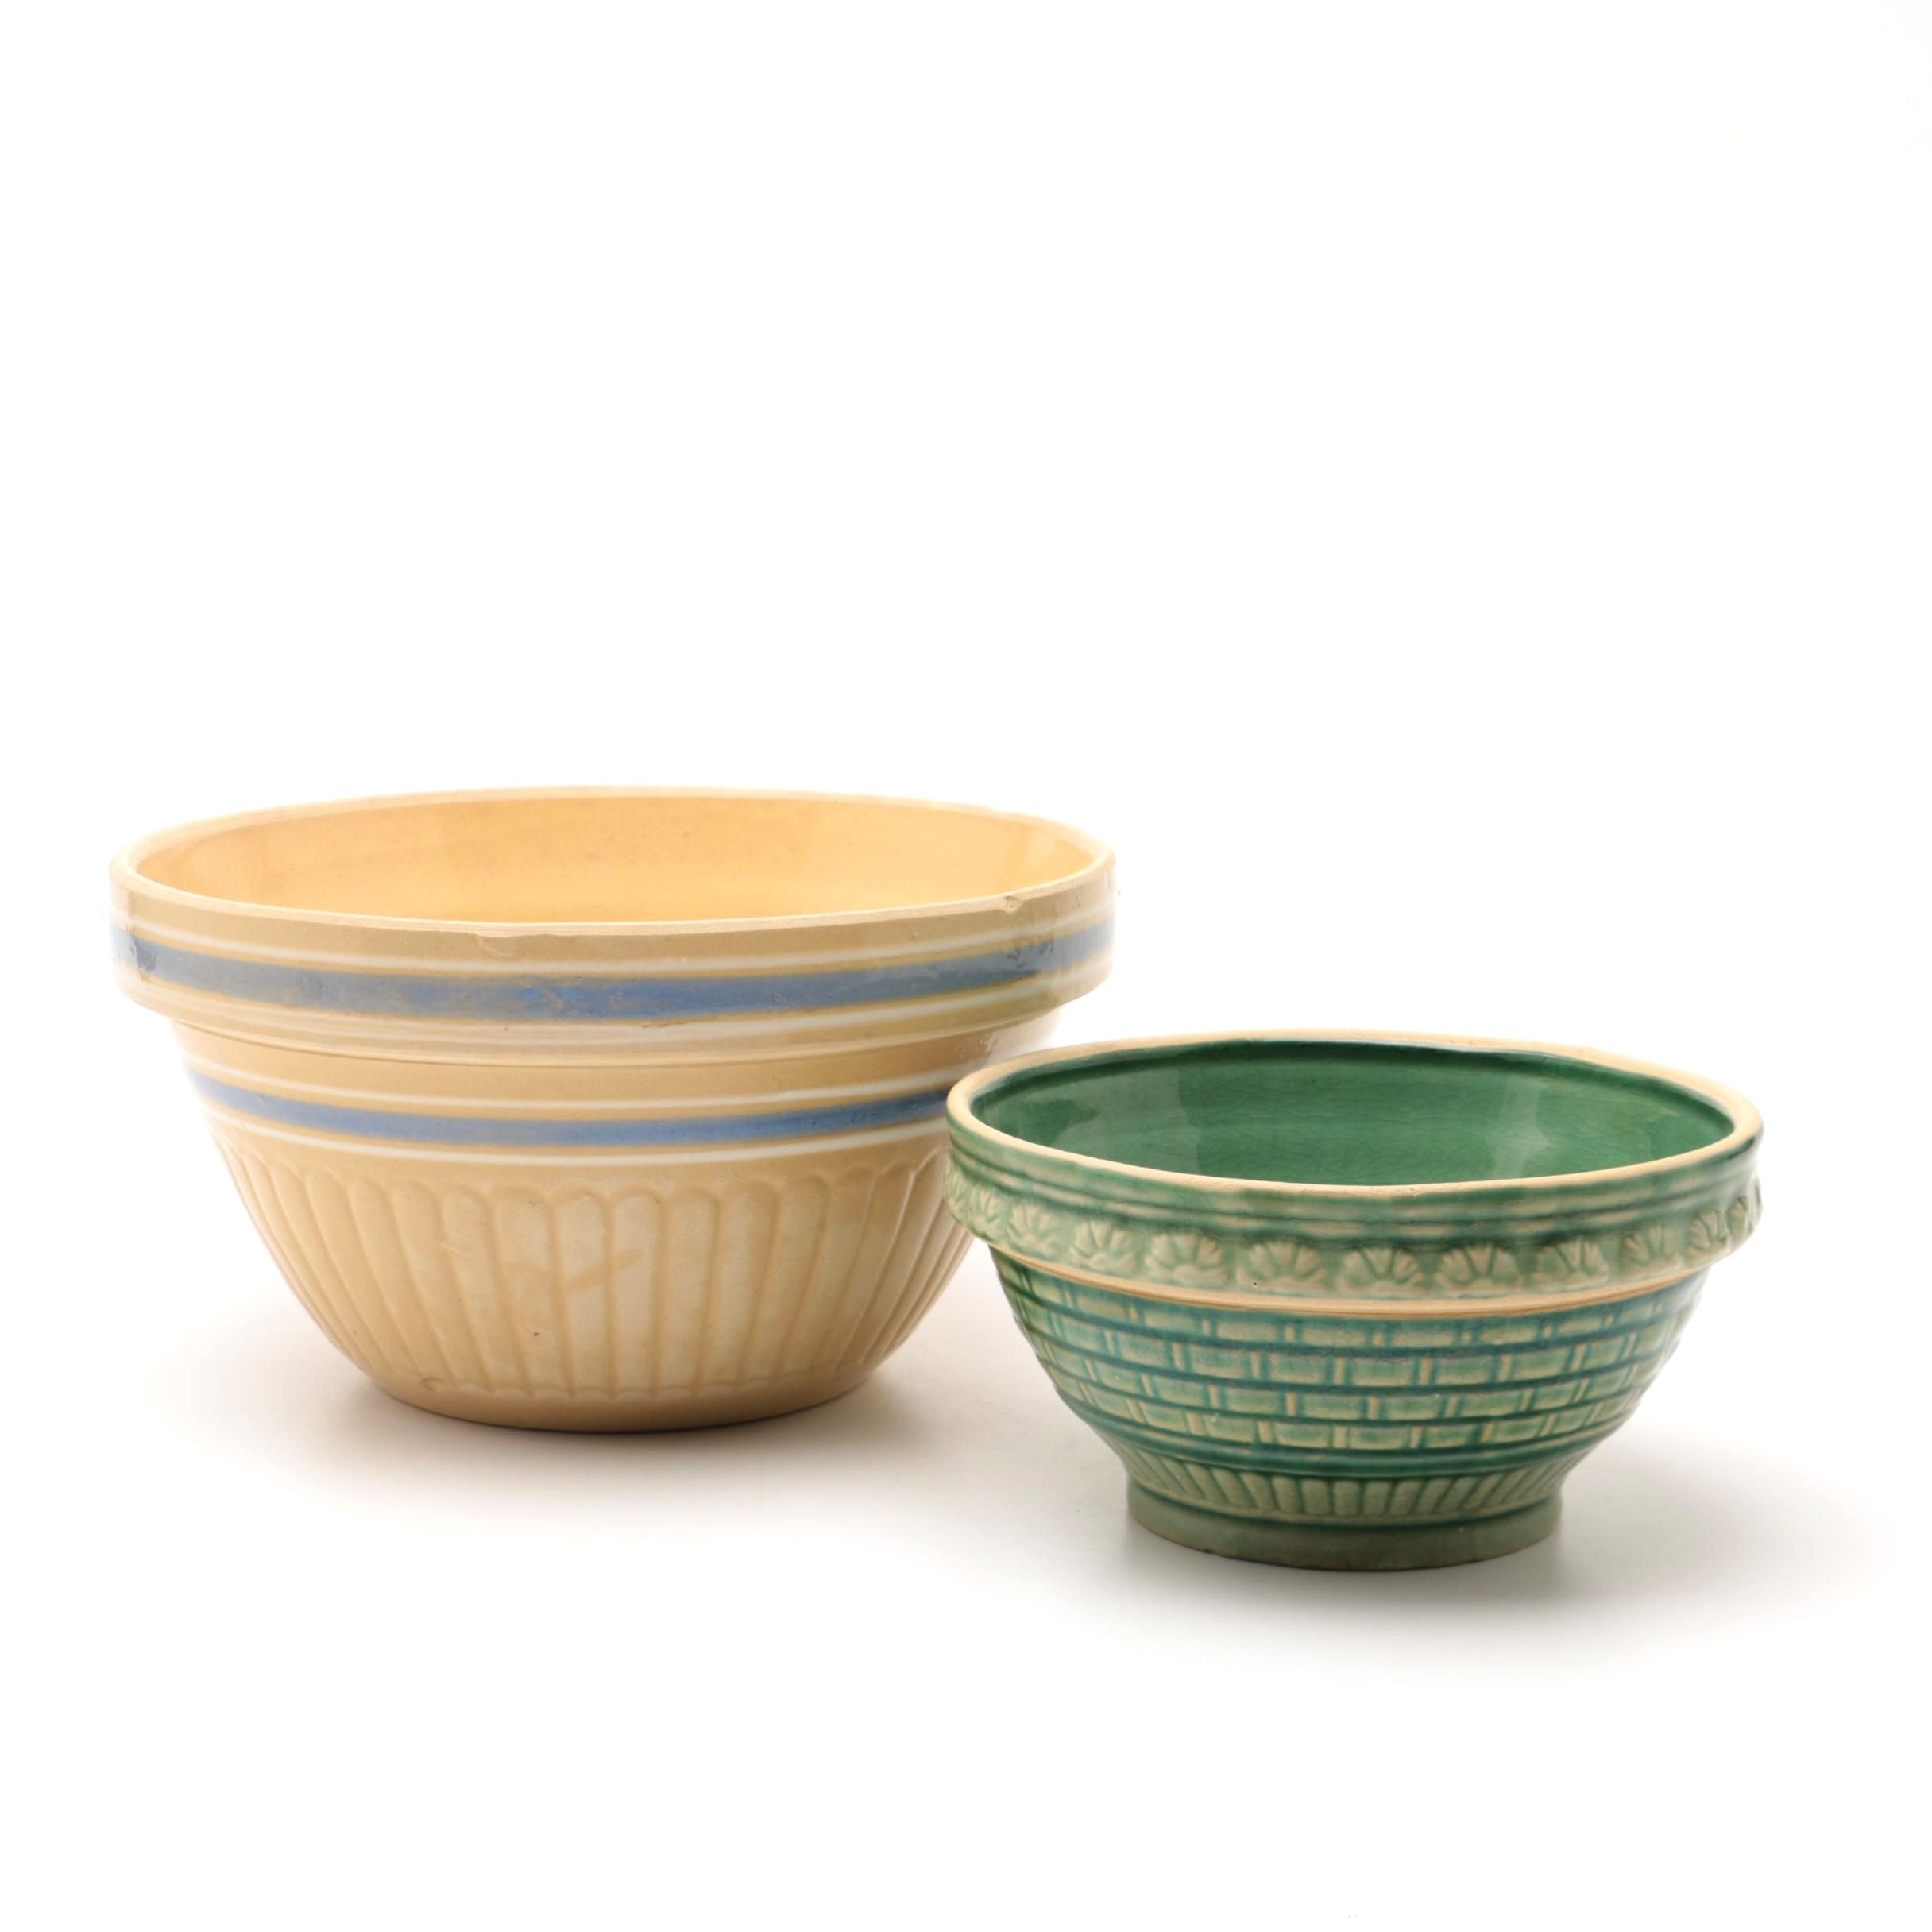 Vintage Yellow Ware Mixing Bowls including Robinson Ransbottom